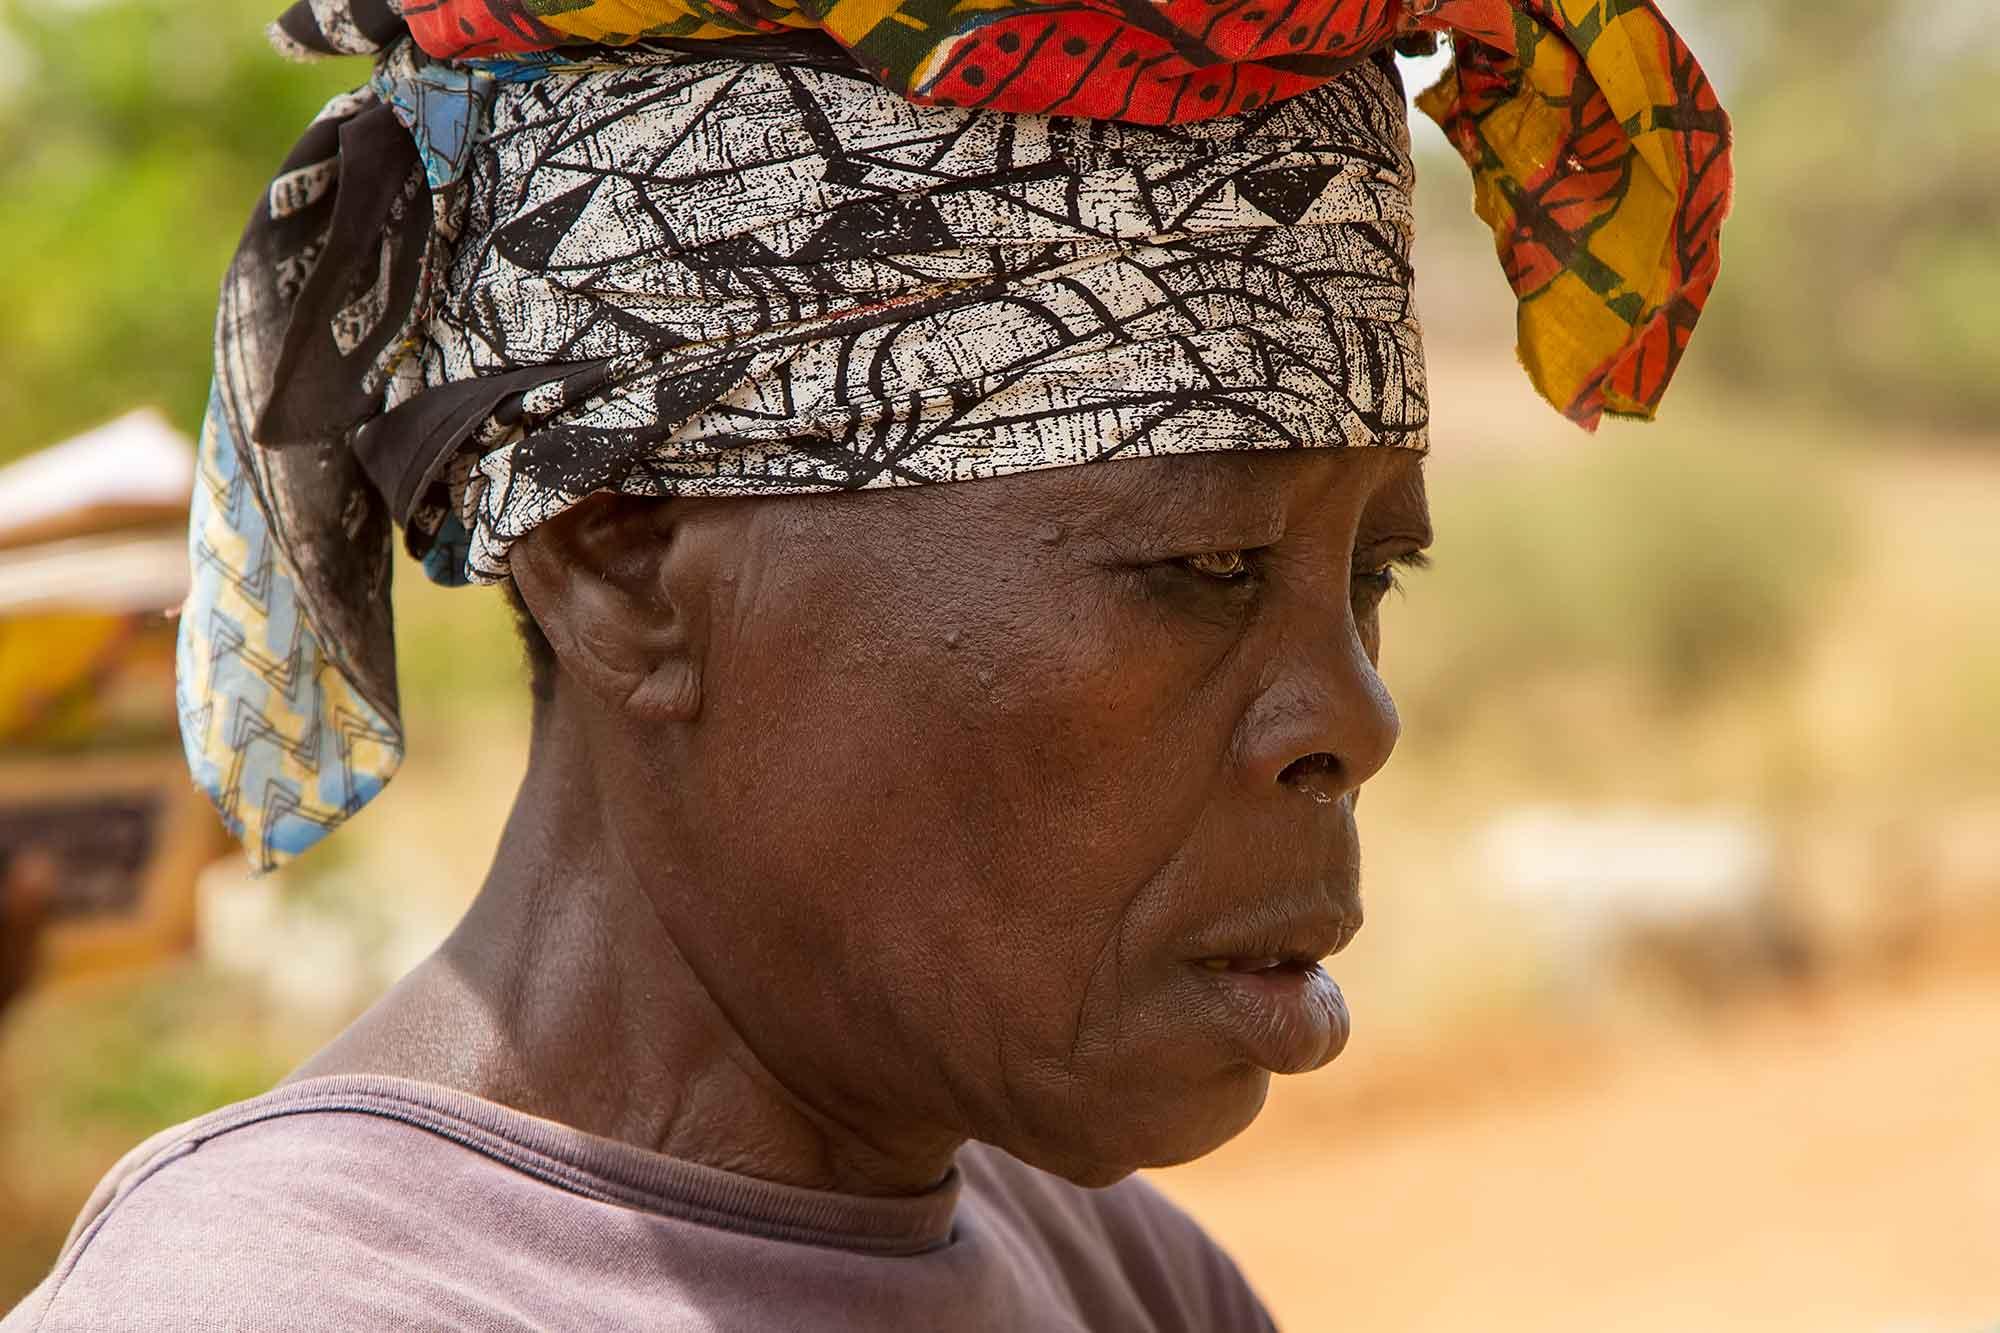 banfora-working-woman-portrait-burkina-faso-africa